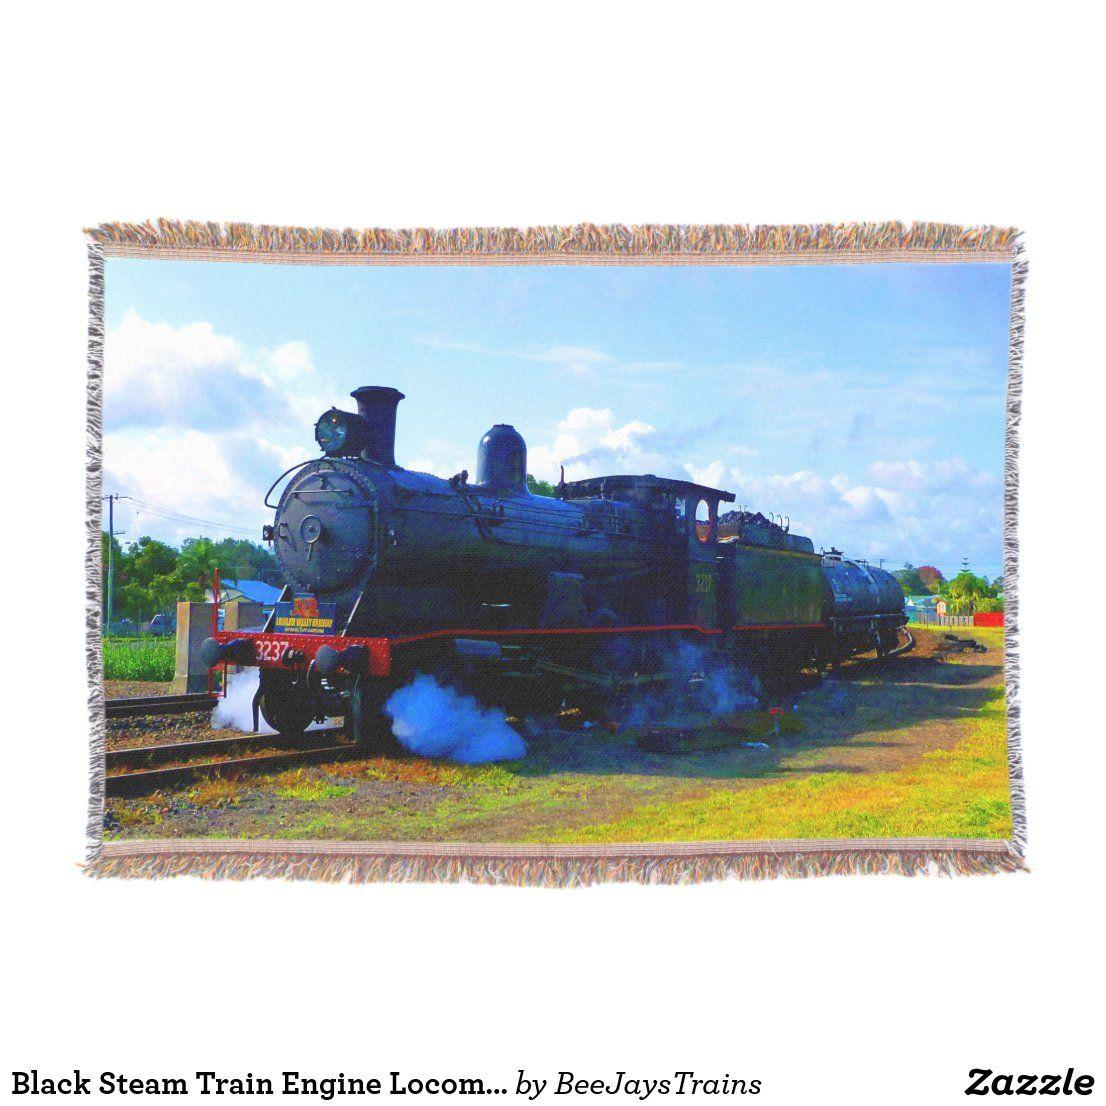 Black Steam Train Engine Locomotive Railroad Throw Blanket Zazzle Com Train Engines Steam Trains Locomotive